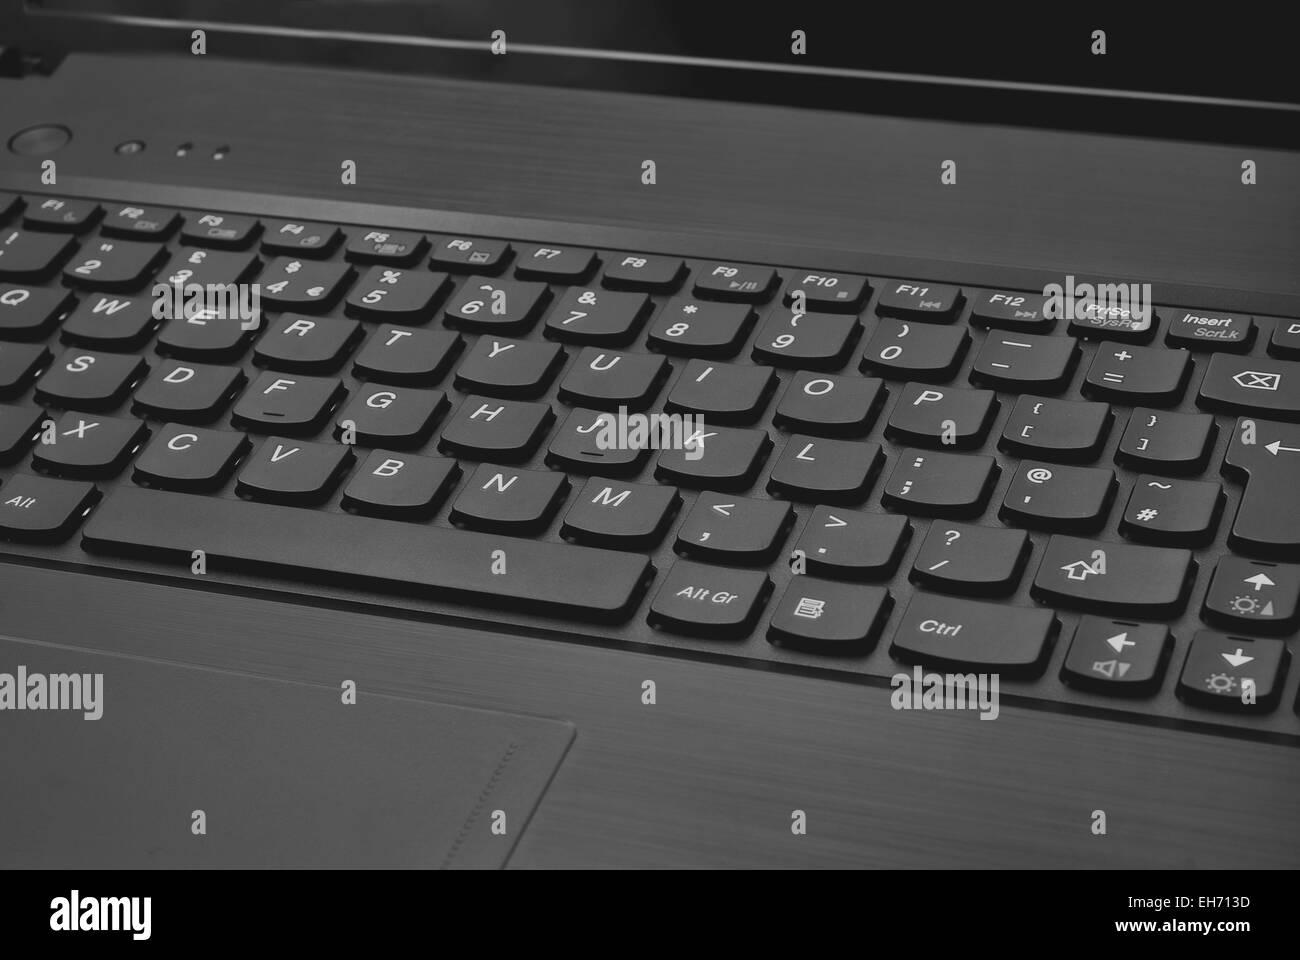 laptop tastatur nahaufnahme hintergrundtextur stockfoto. Black Bedroom Furniture Sets. Home Design Ideas